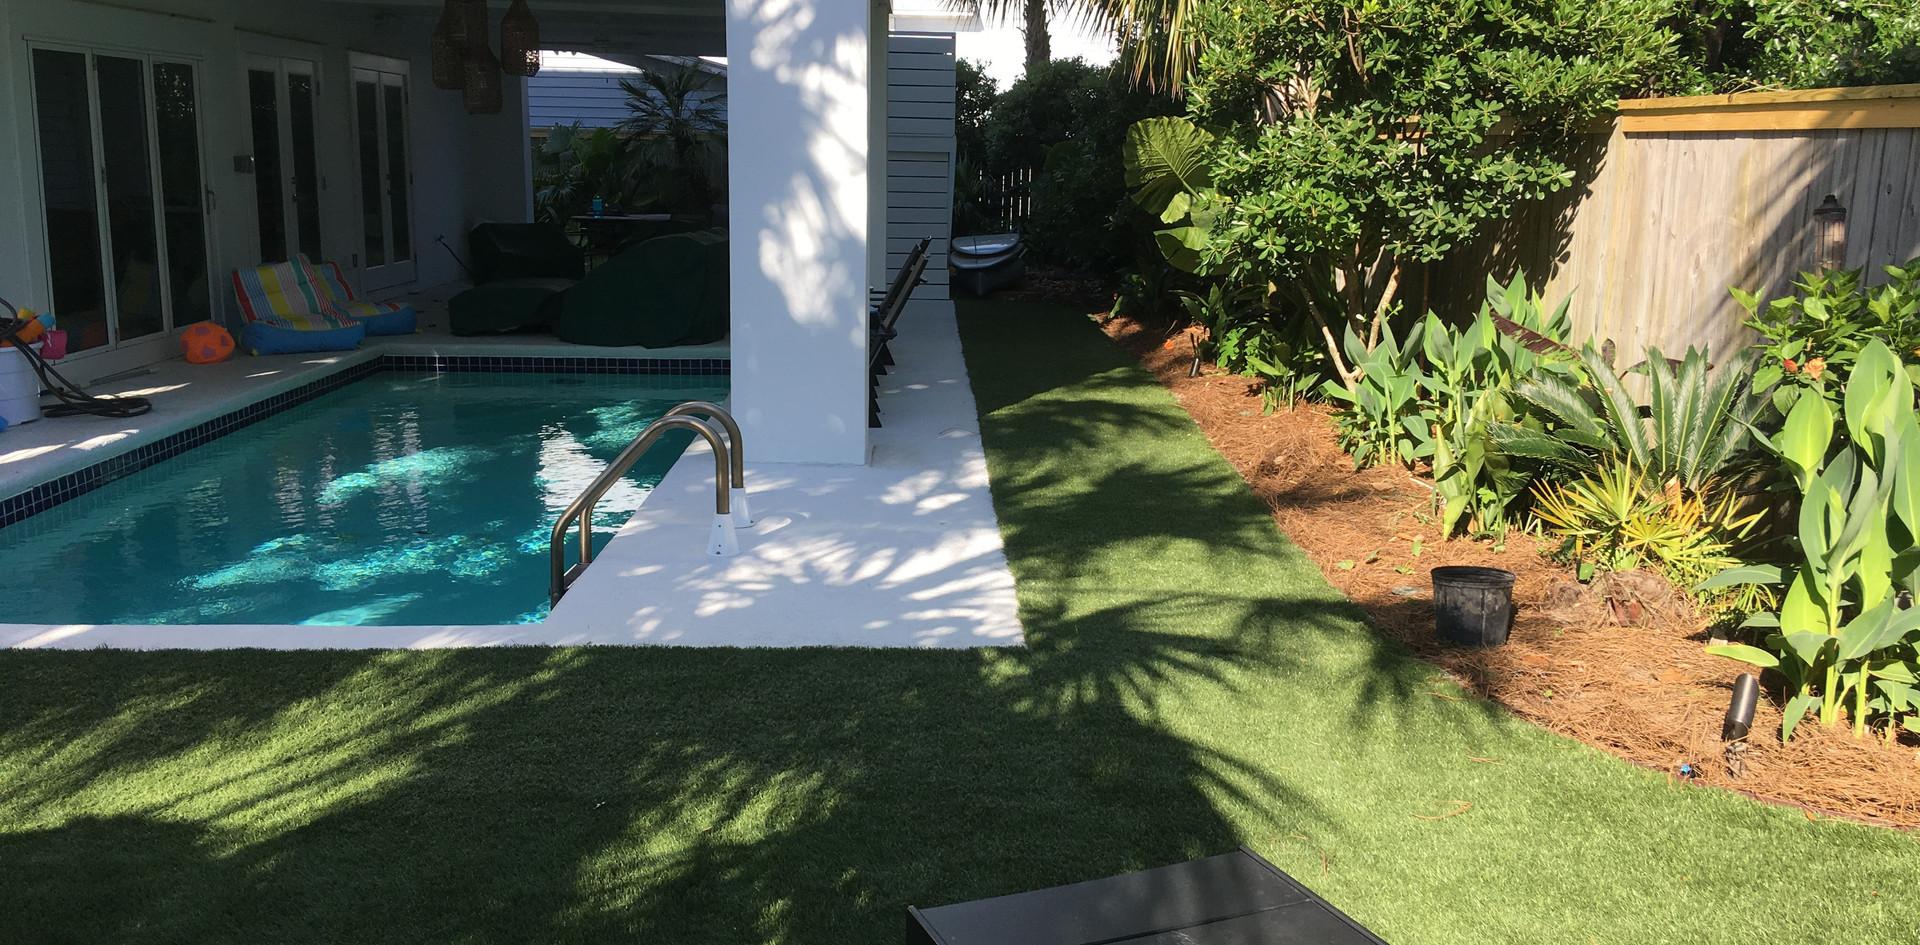 turf around under deck pool area.jpg